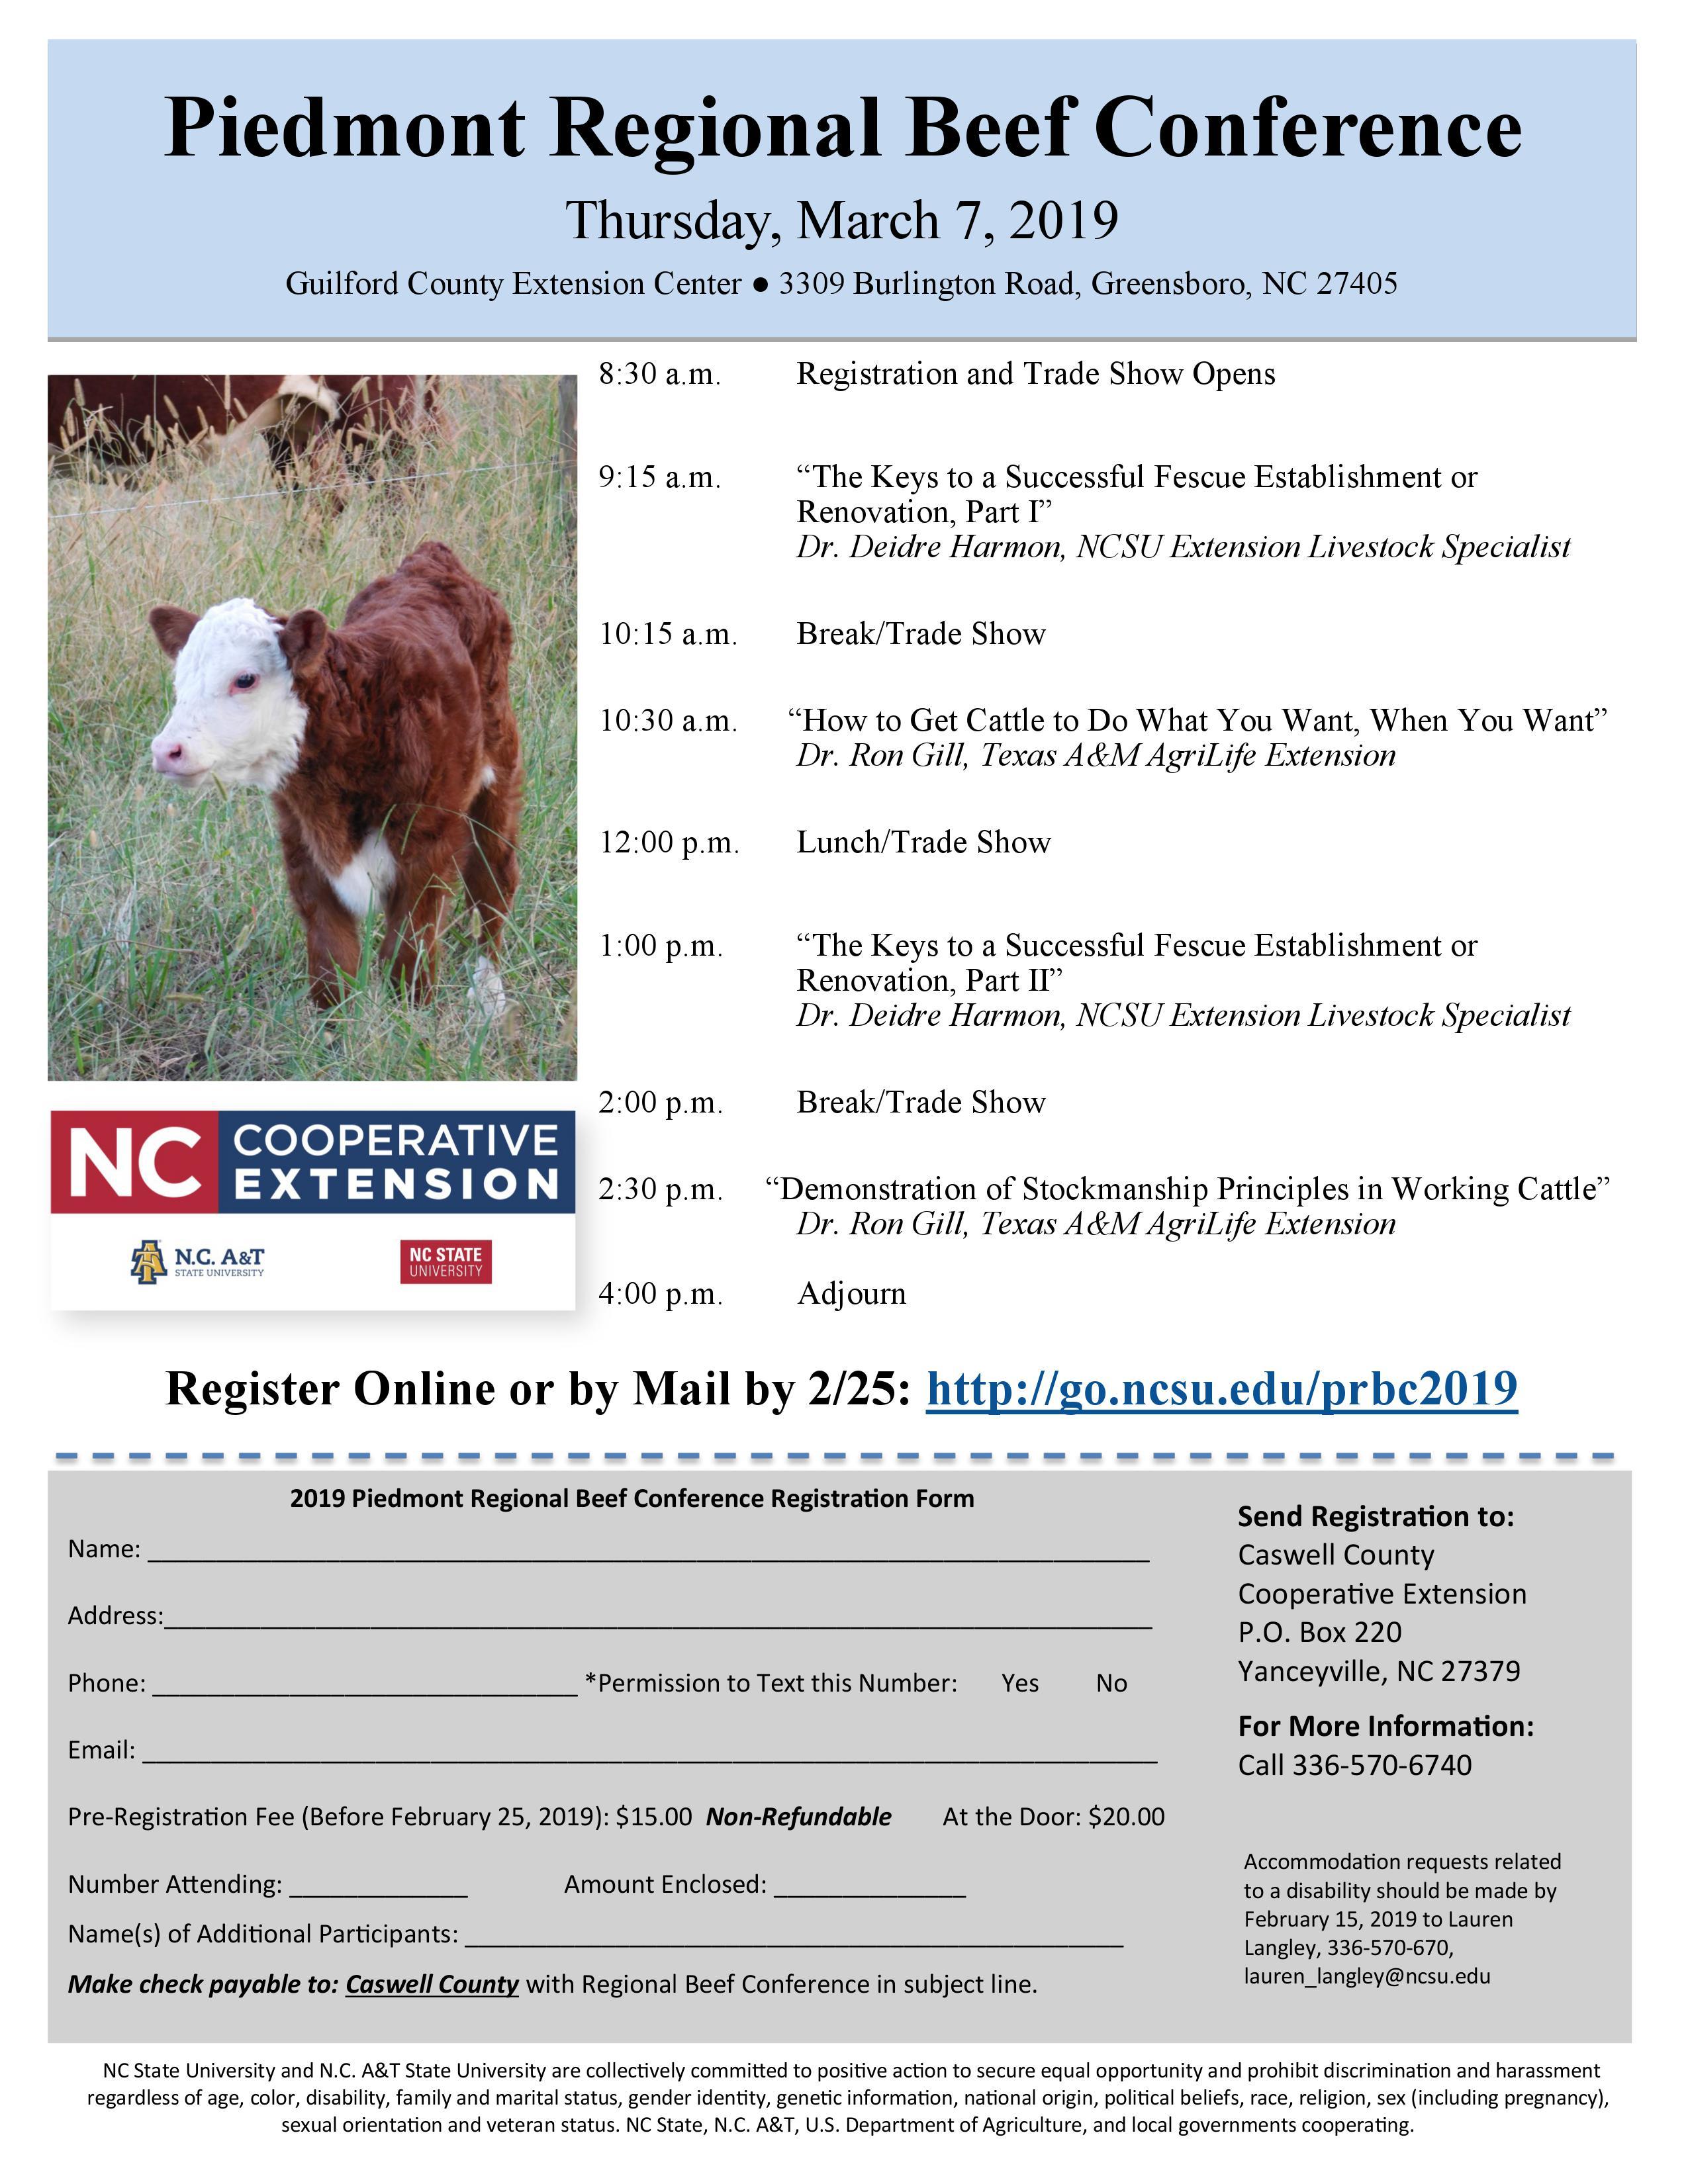 Piedmont Regional Beef Conference flyer image